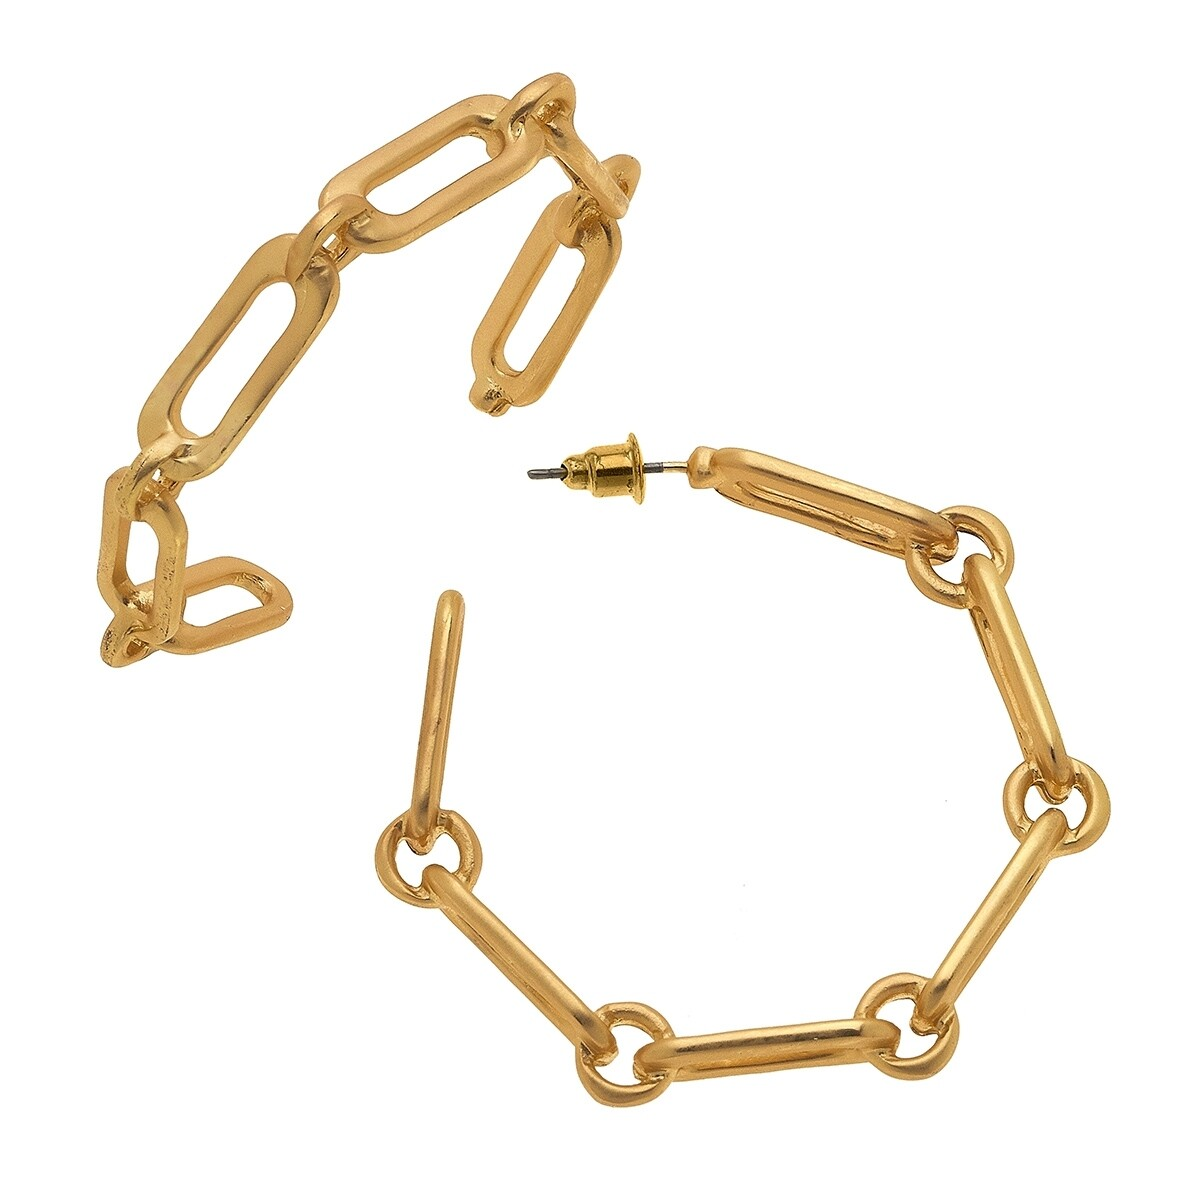 Nora Chain Link Earrings